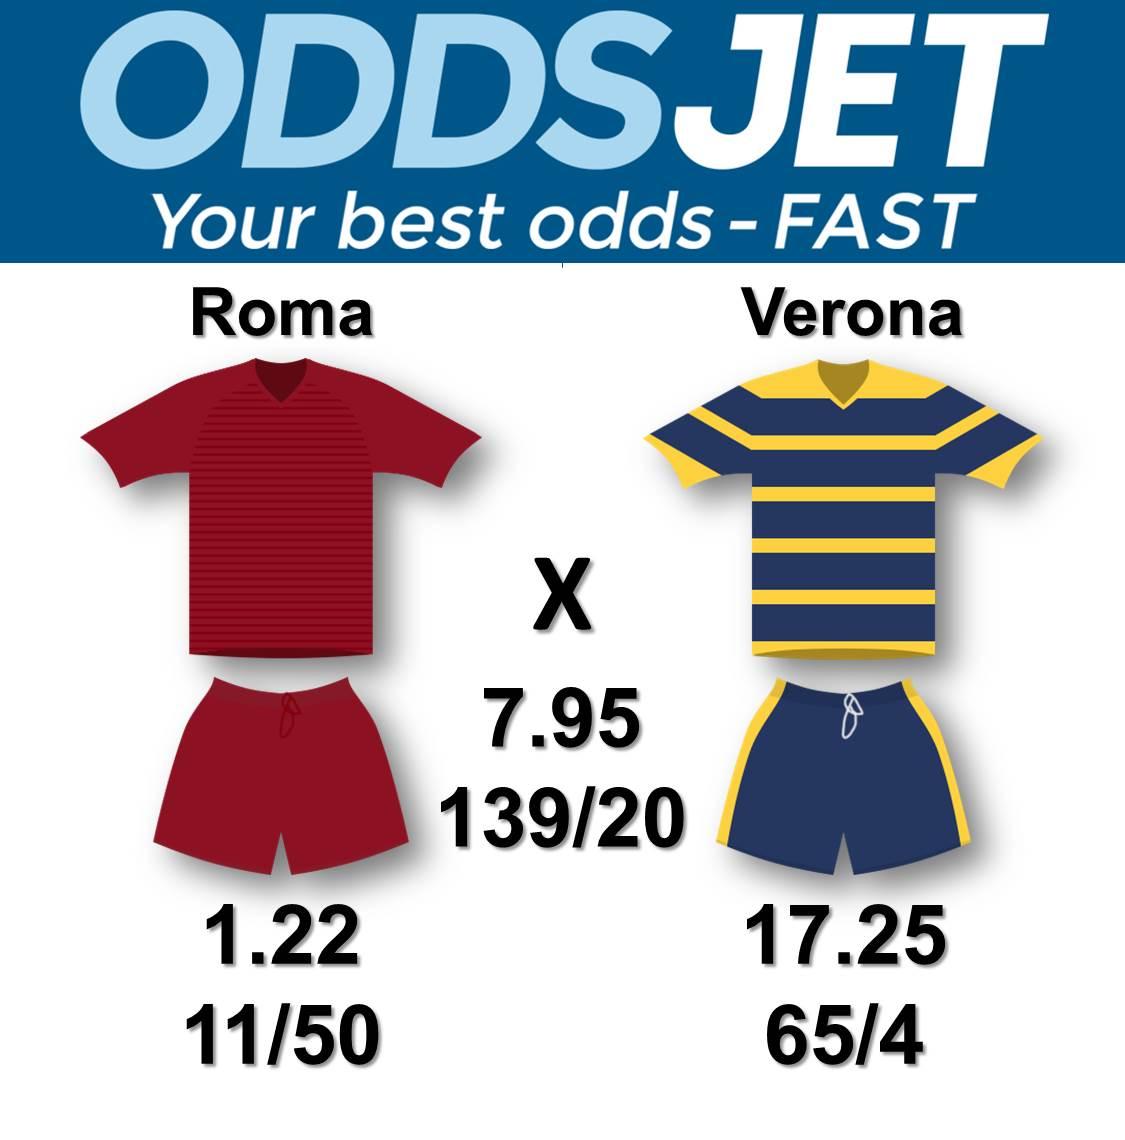 #SerieA, #RomaVerona, #ROM, #ASRoma, #ASR, vs. #Verona, #HVFC, #HellasVeronaFC, Get your best odds - fast at  https:// oddsjet.com  &nbsp;  <br>http://pic.twitter.com/TdJs9ueLYN